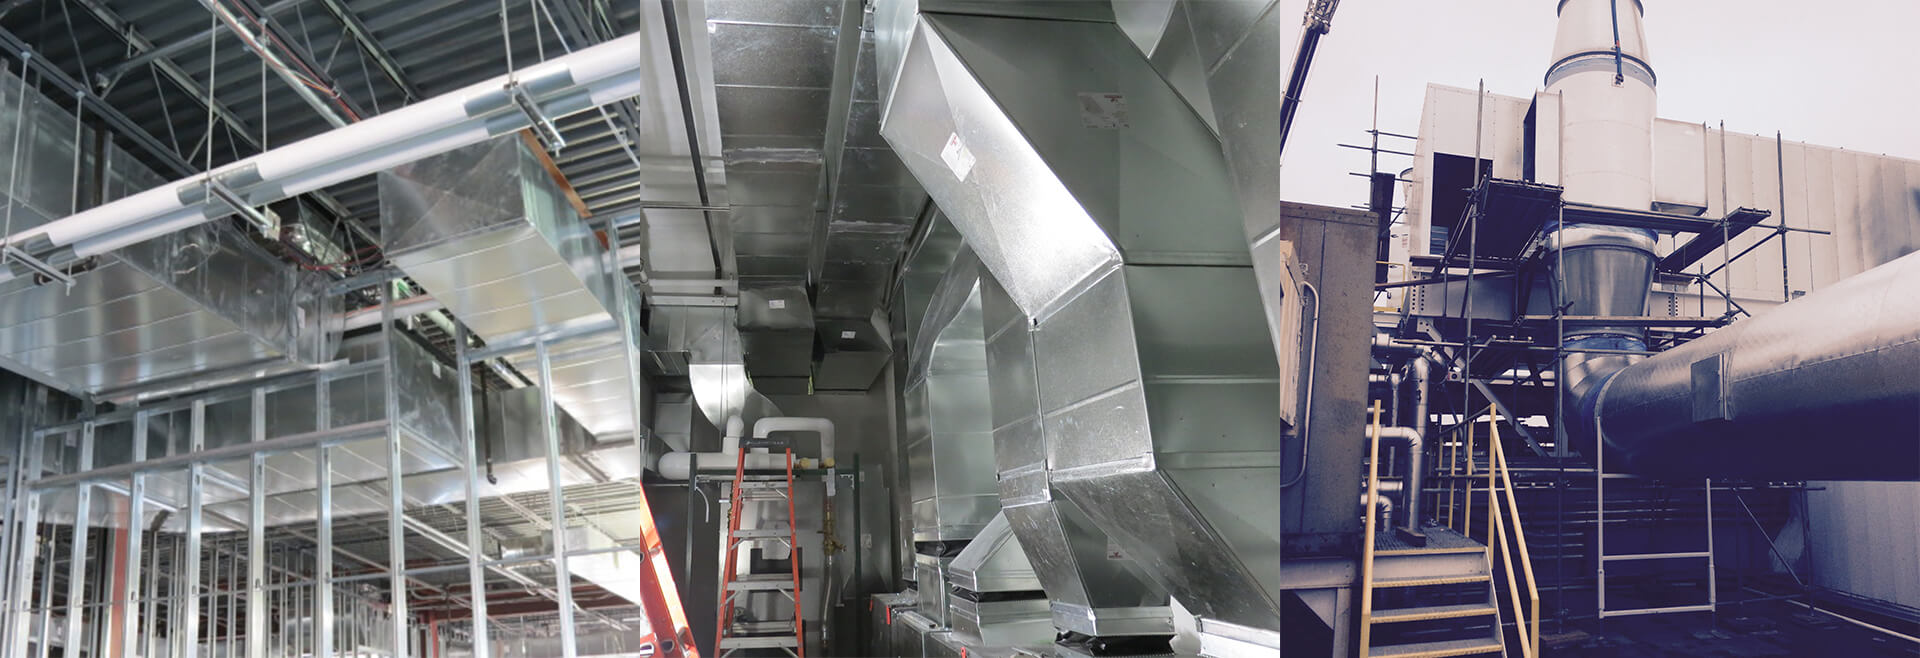 D&S Sheetmetal HVAC Projects